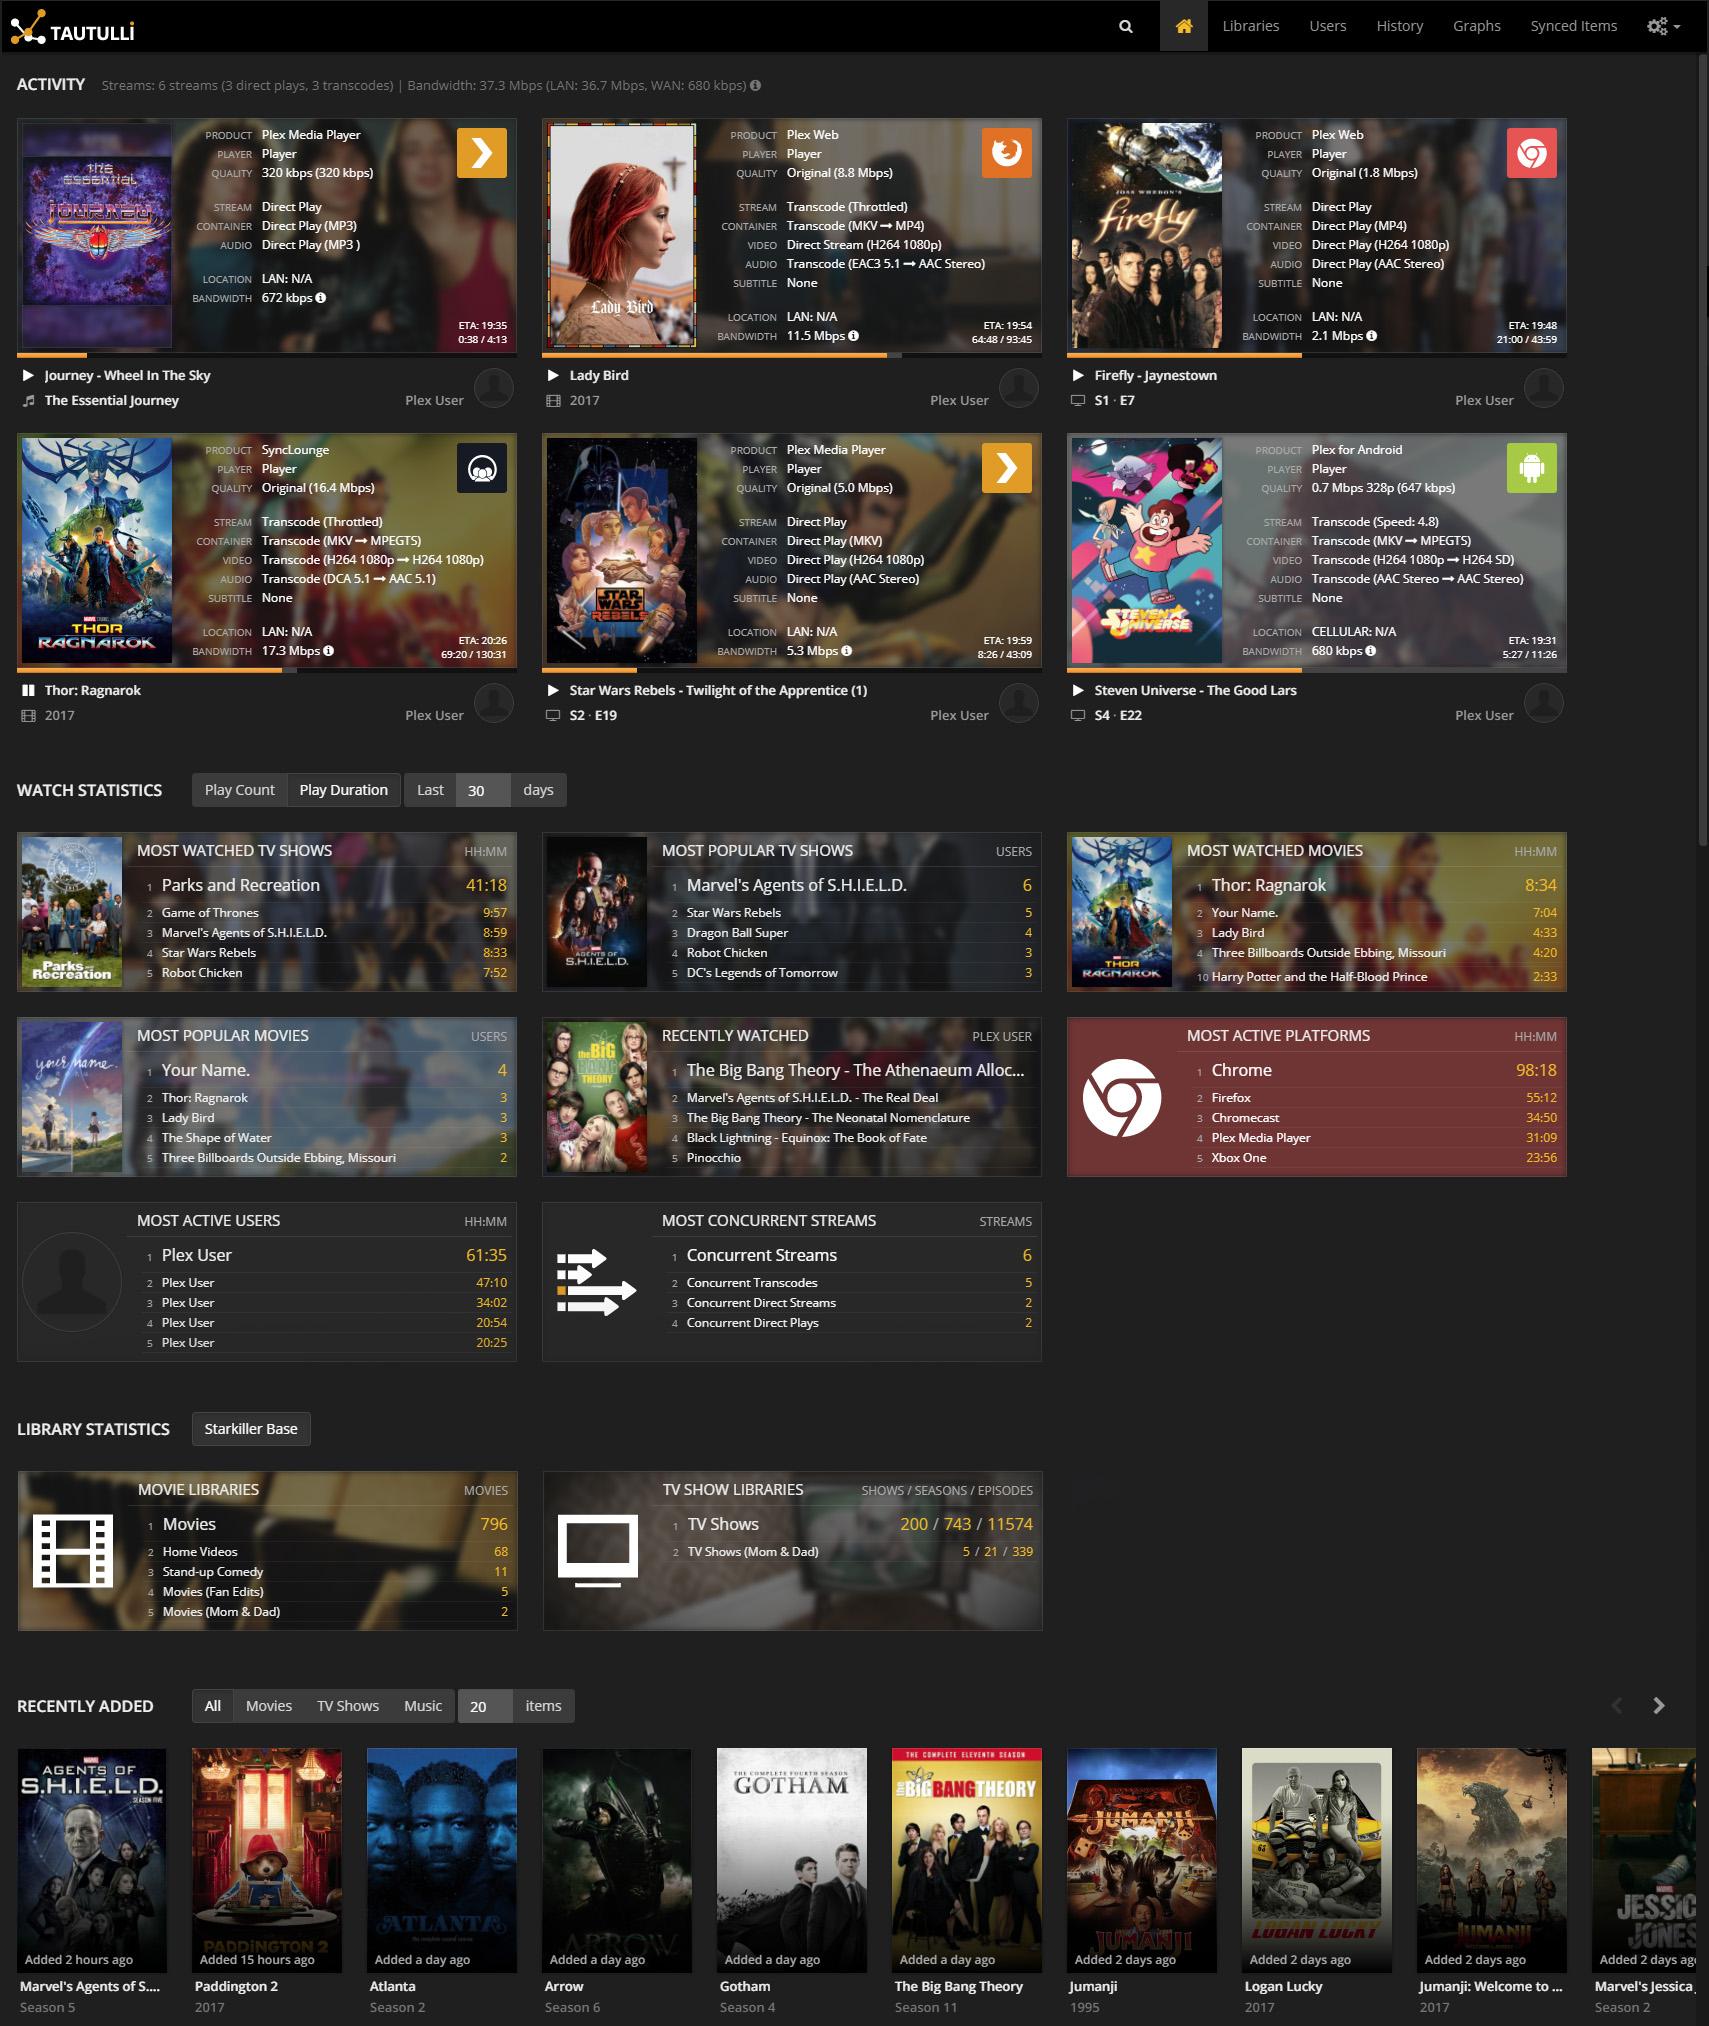 plex media server user guide